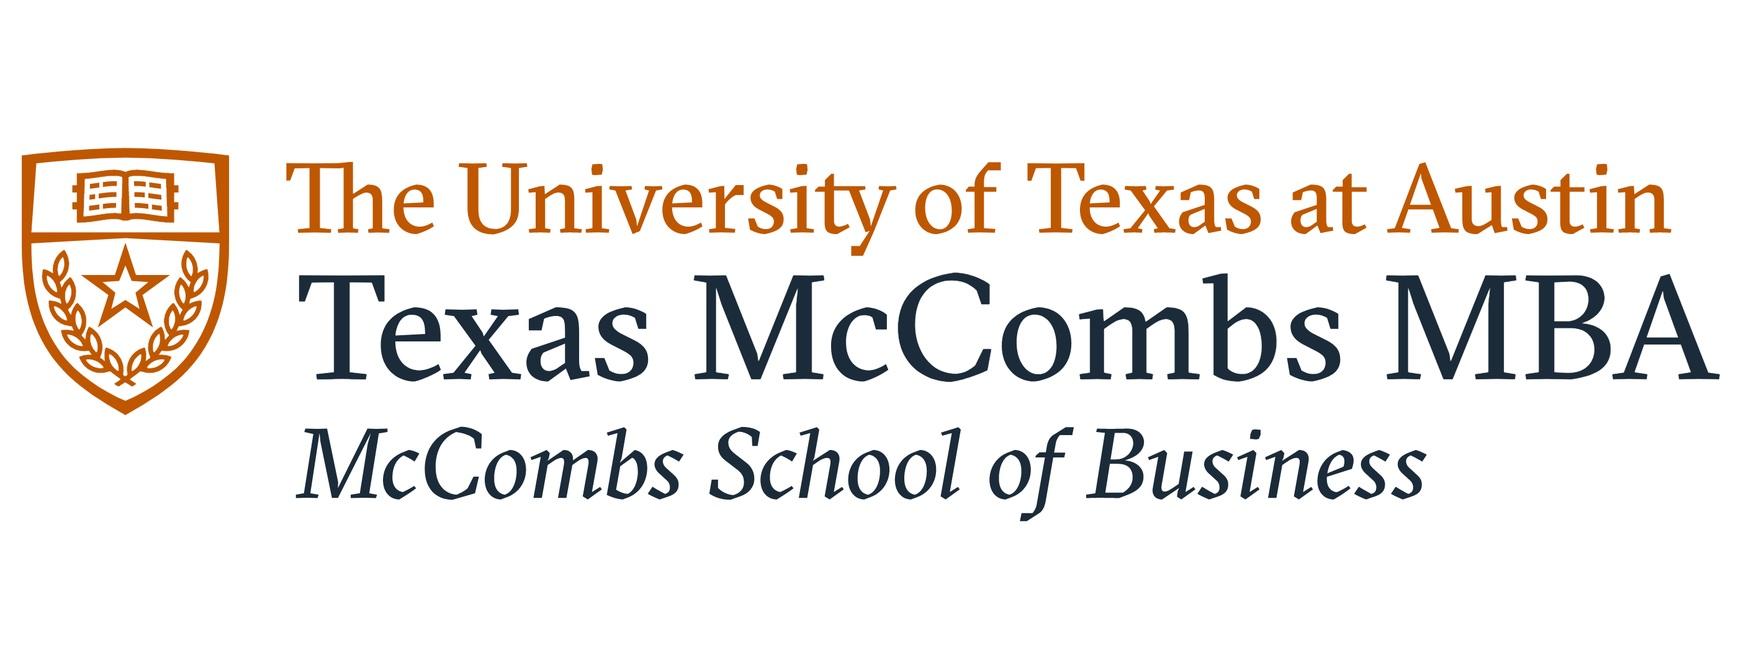 McComb+-+MBA+Logo.jpg